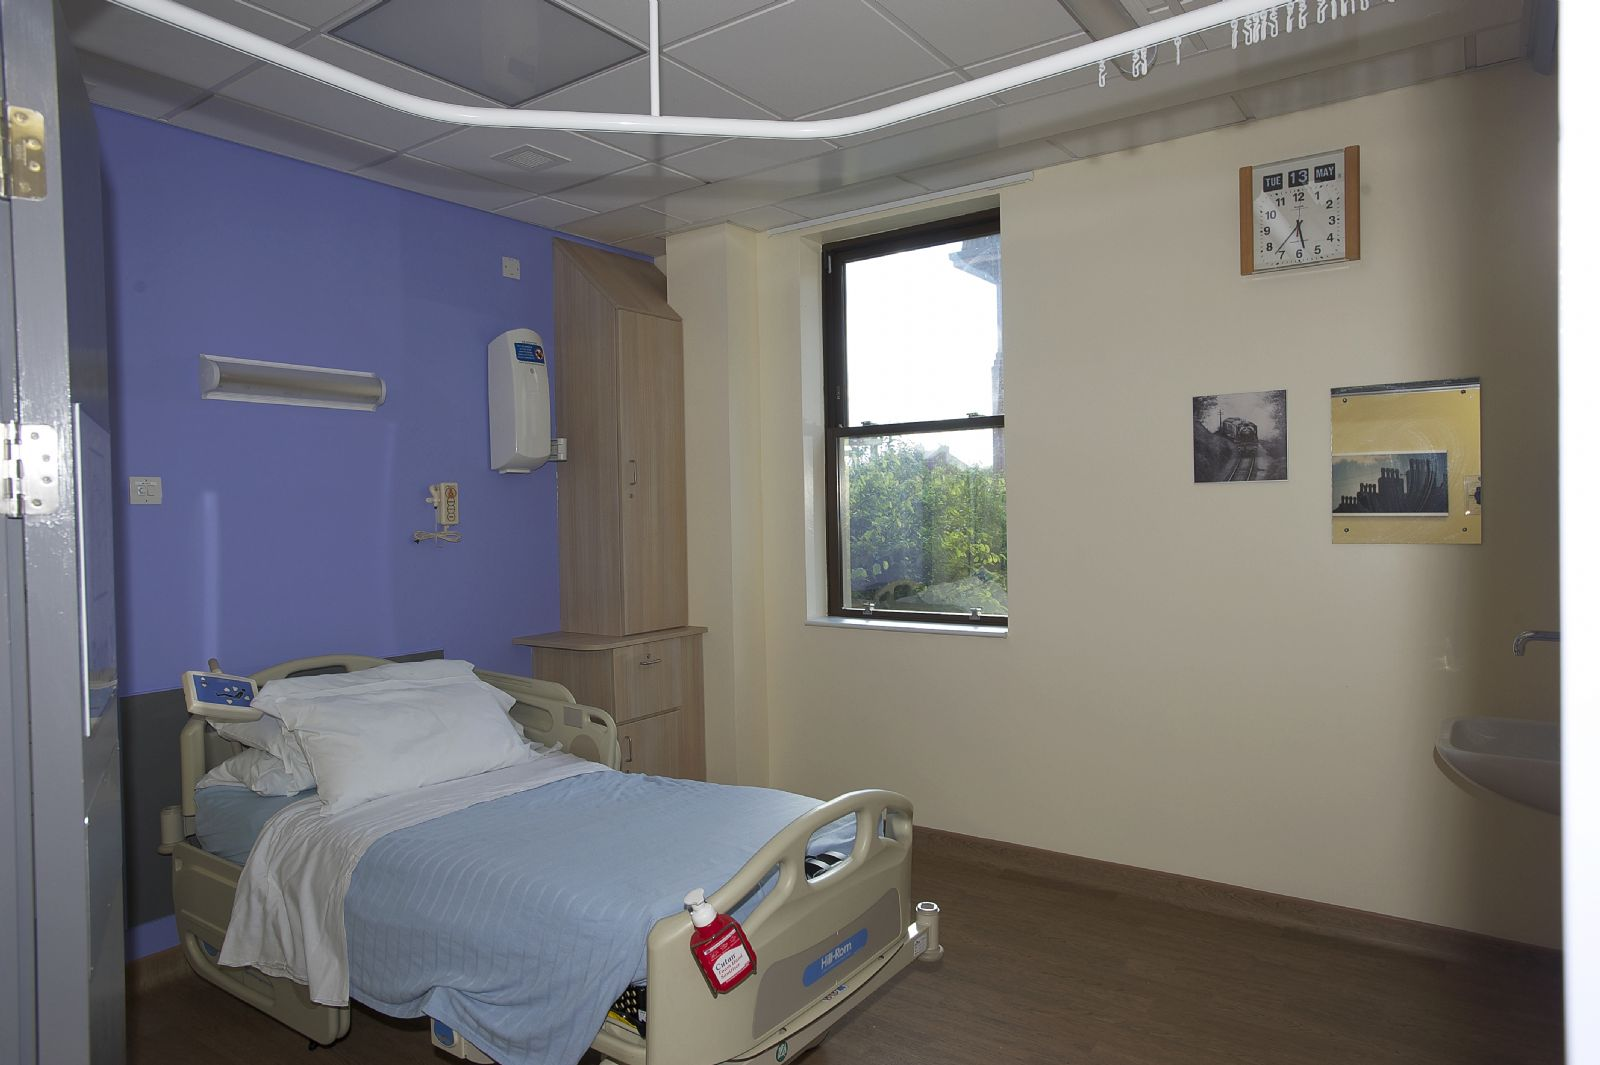 Improved dementia care in Warrington